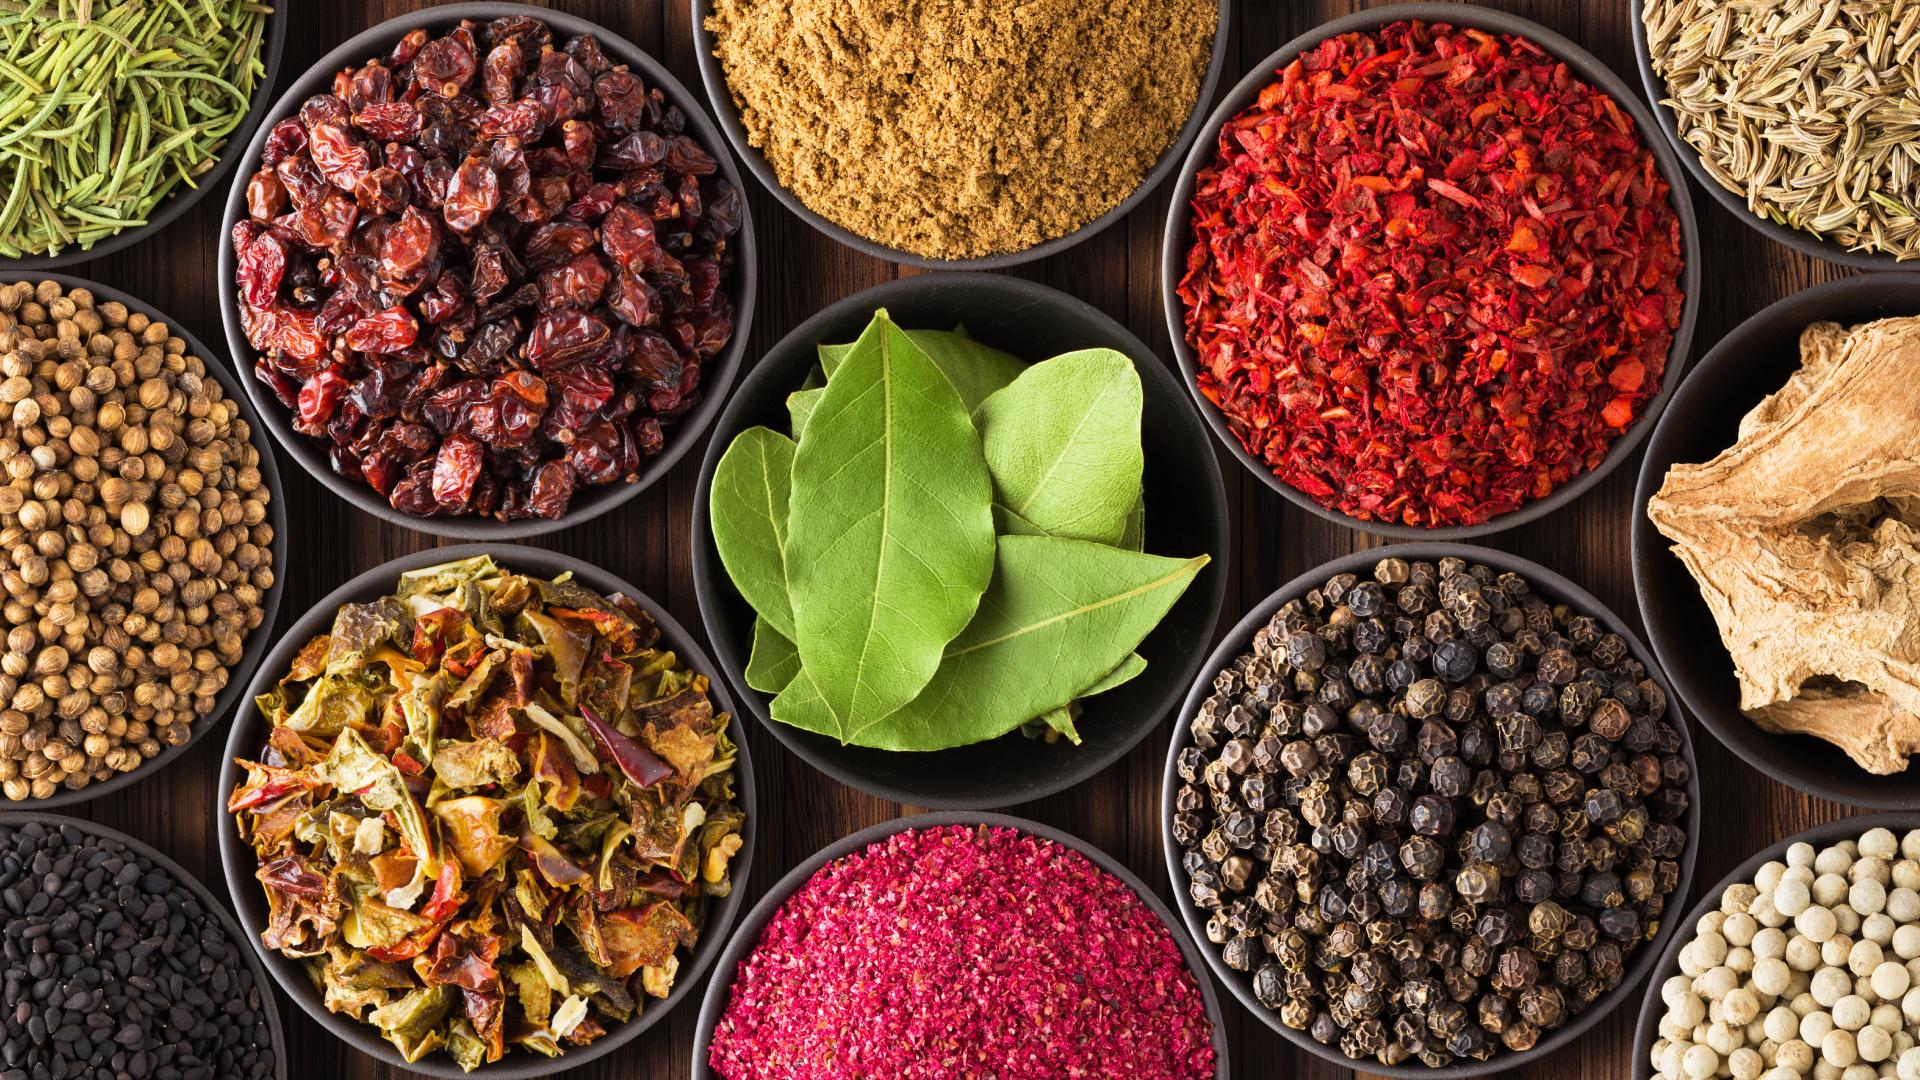 Yoruba Herbs and Their Benefits